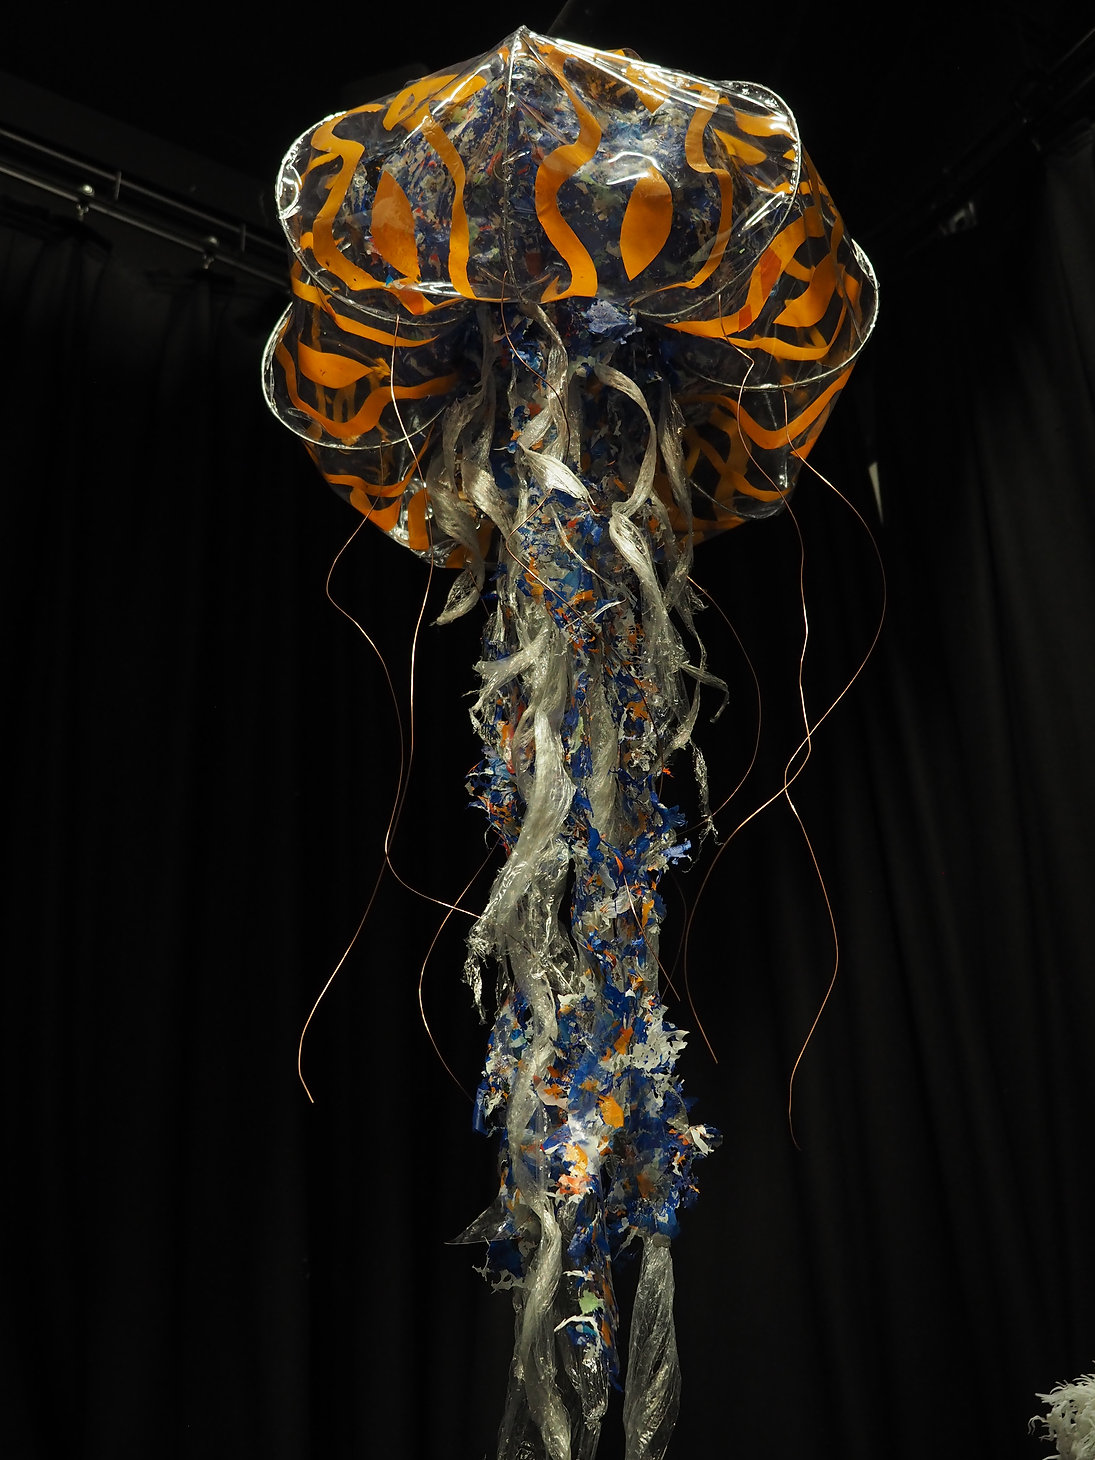 Upcycled Jellyfish